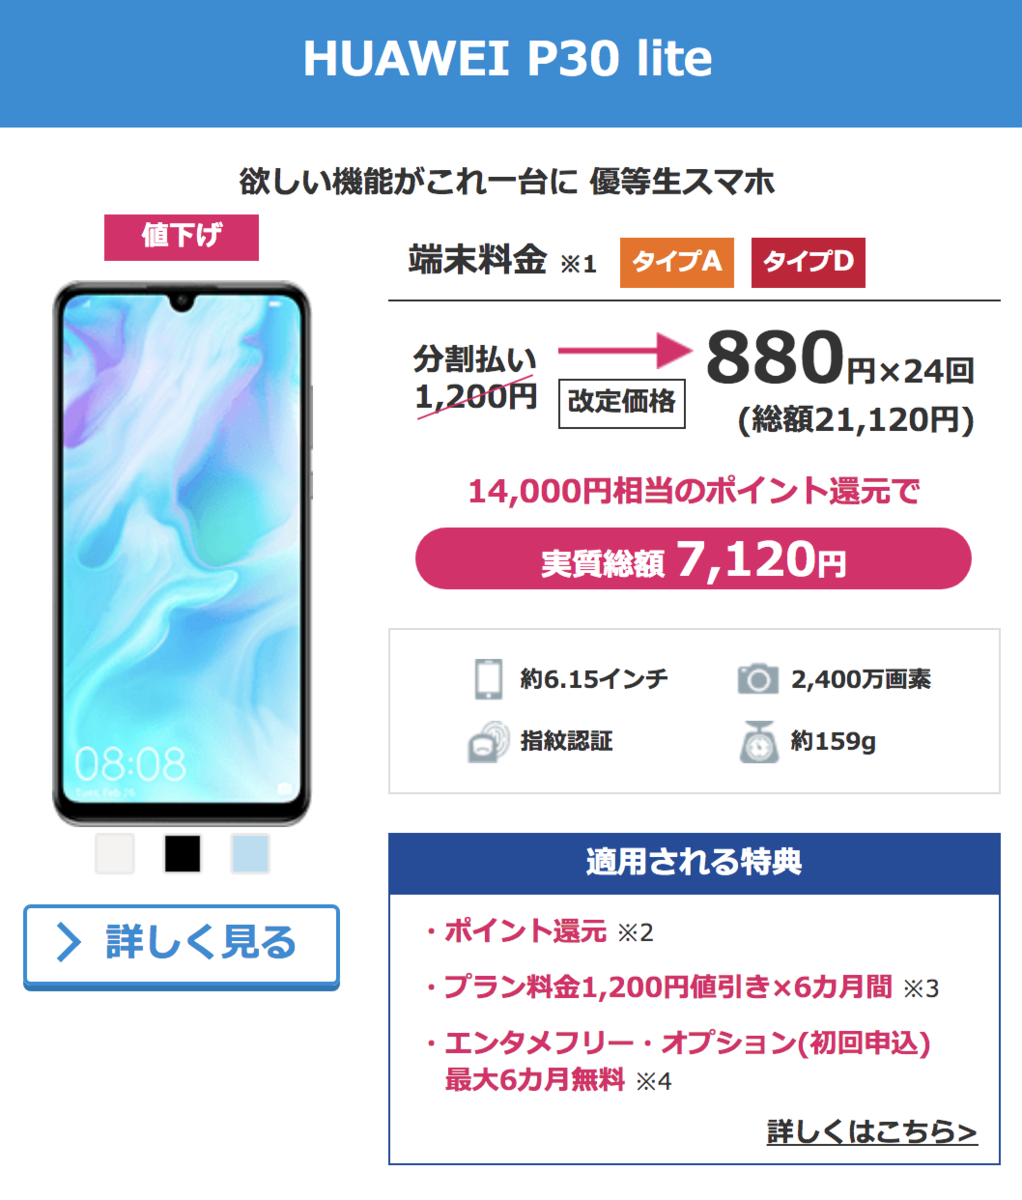 f:id:koiwai_chinatsu:20200325194312p:plain